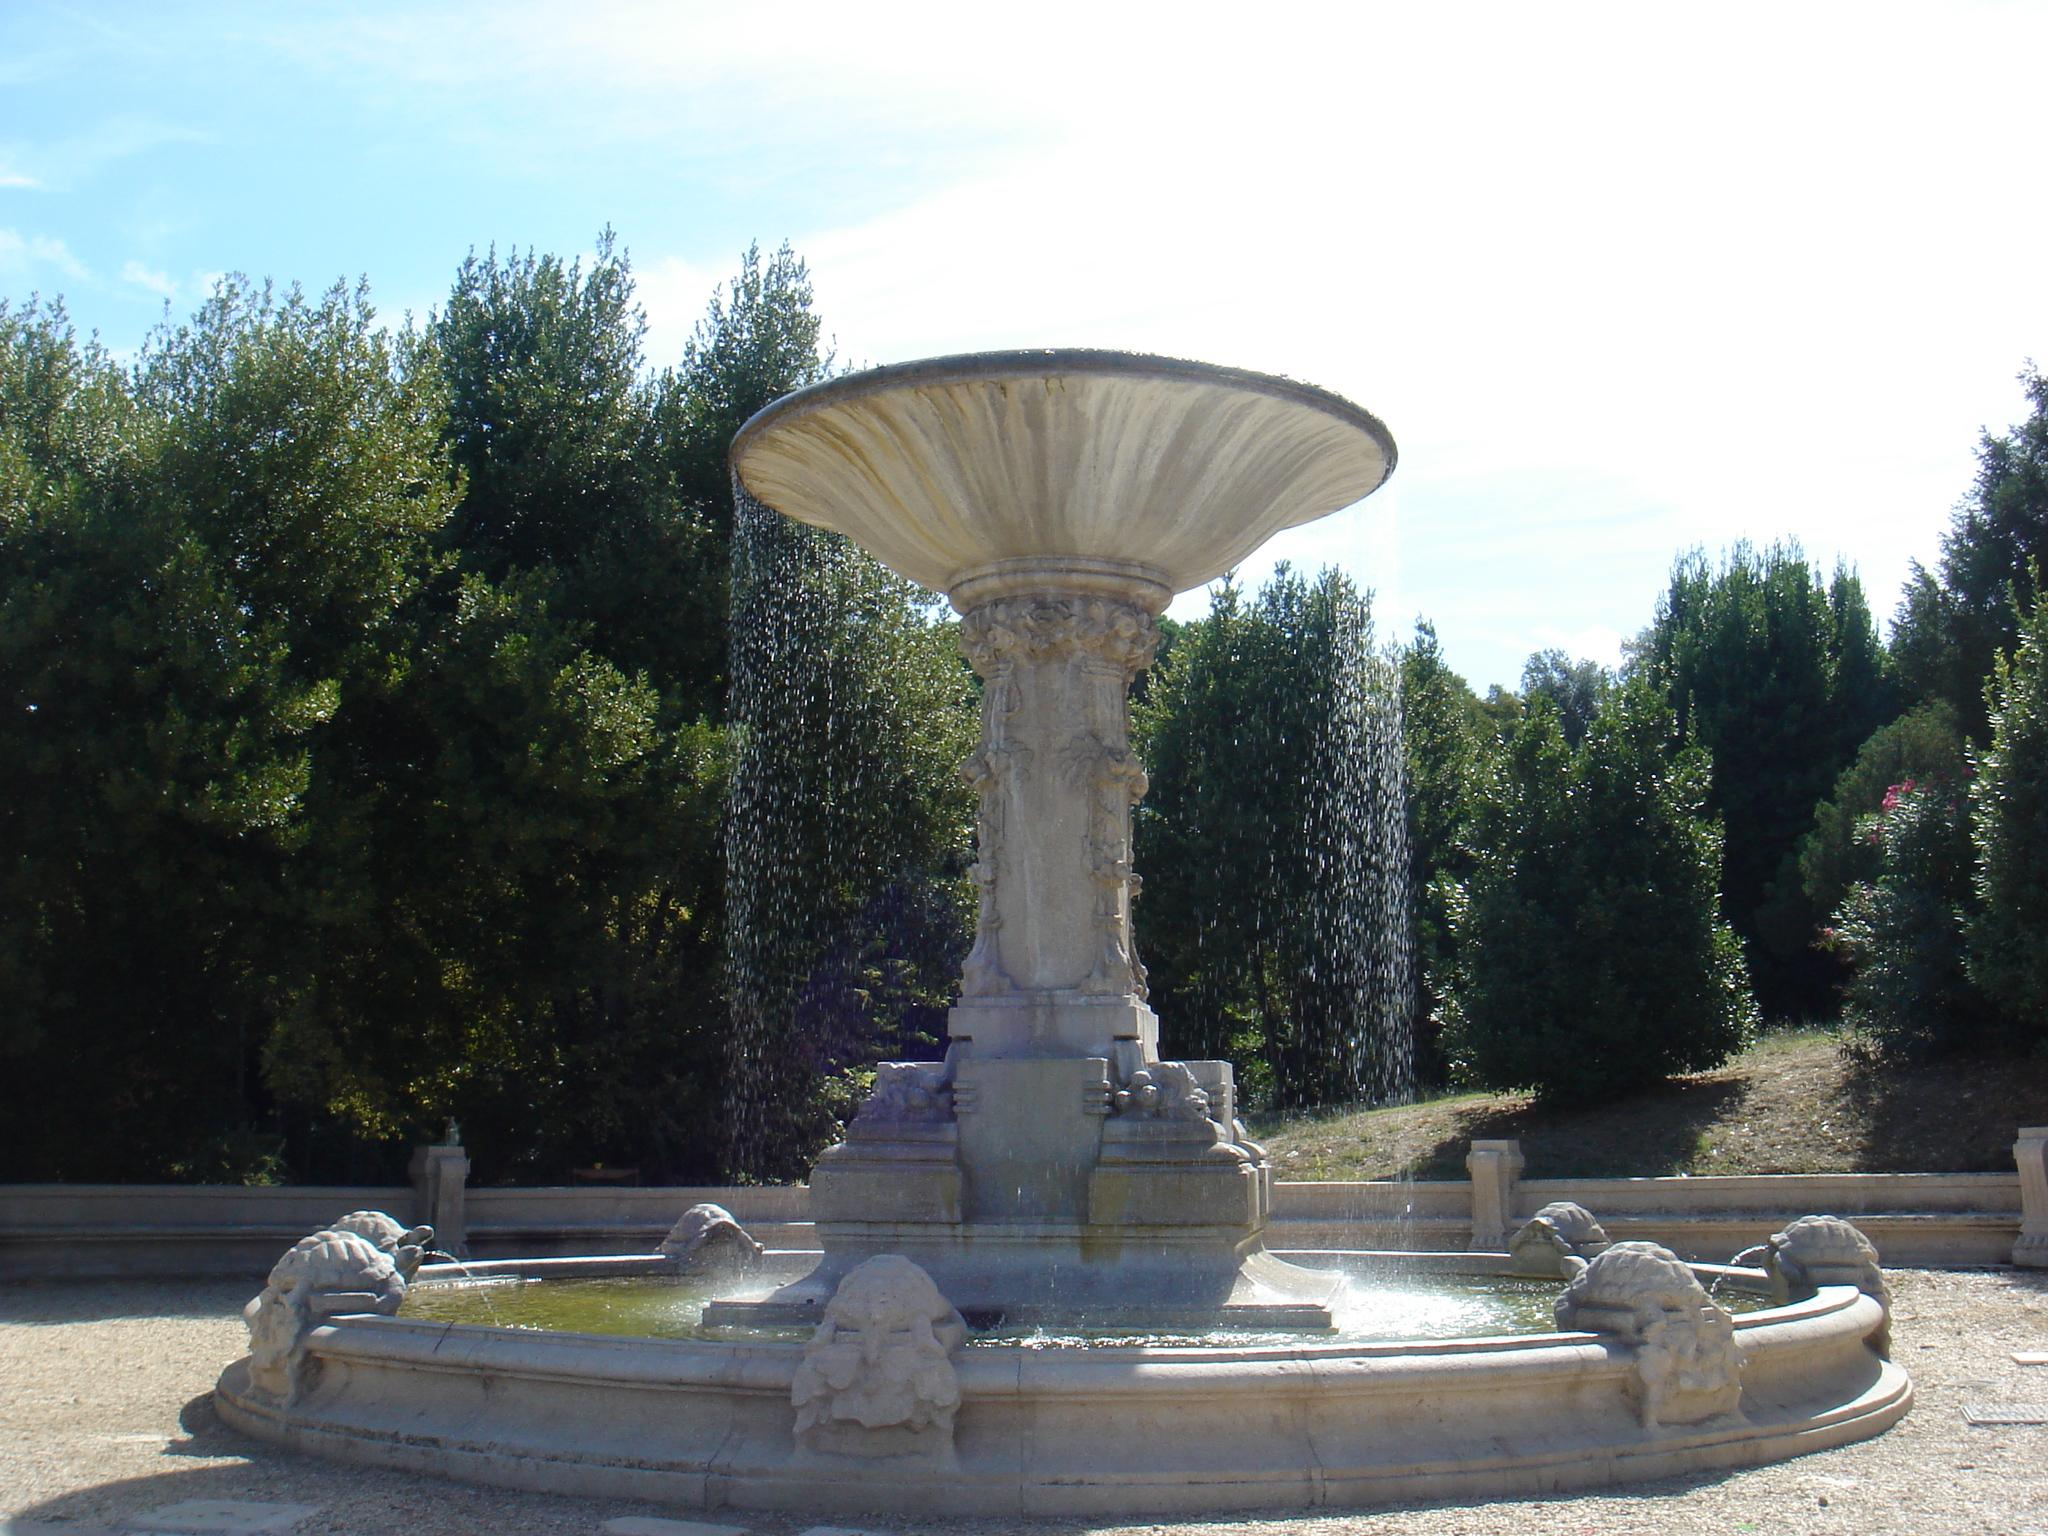 Fontane - Atraktivna arhitektura - Page 2 Villa_Borghese_-_Fontane_Oscure_01219